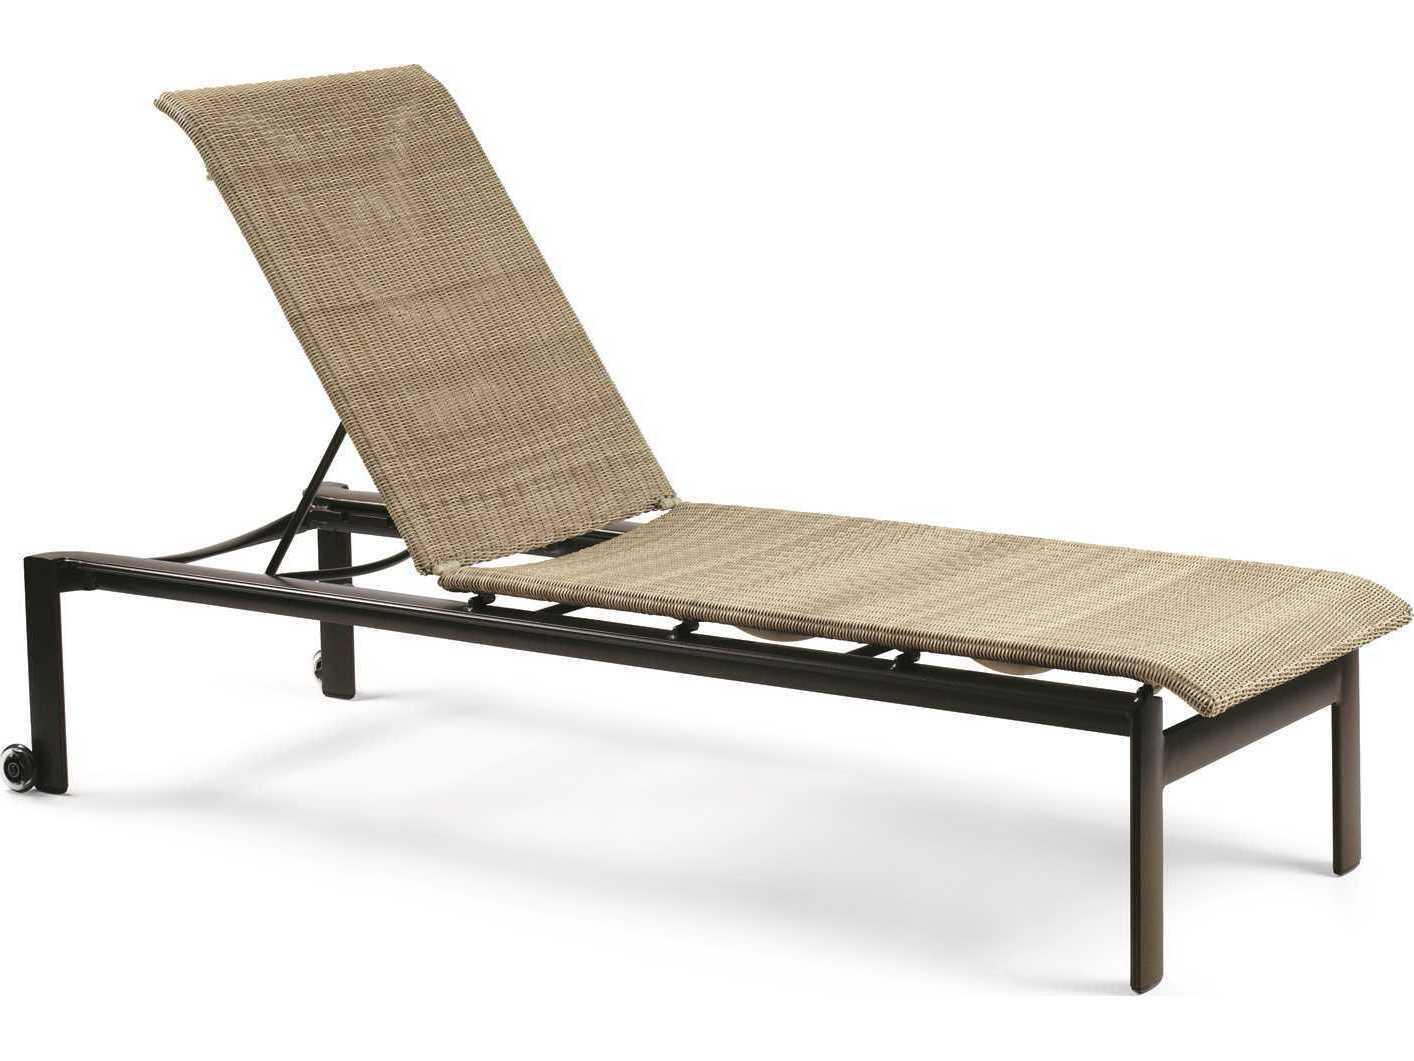 winston belvedere woven aluminum stackable chaise lounge. Black Bedroom Furniture Sets. Home Design Ideas